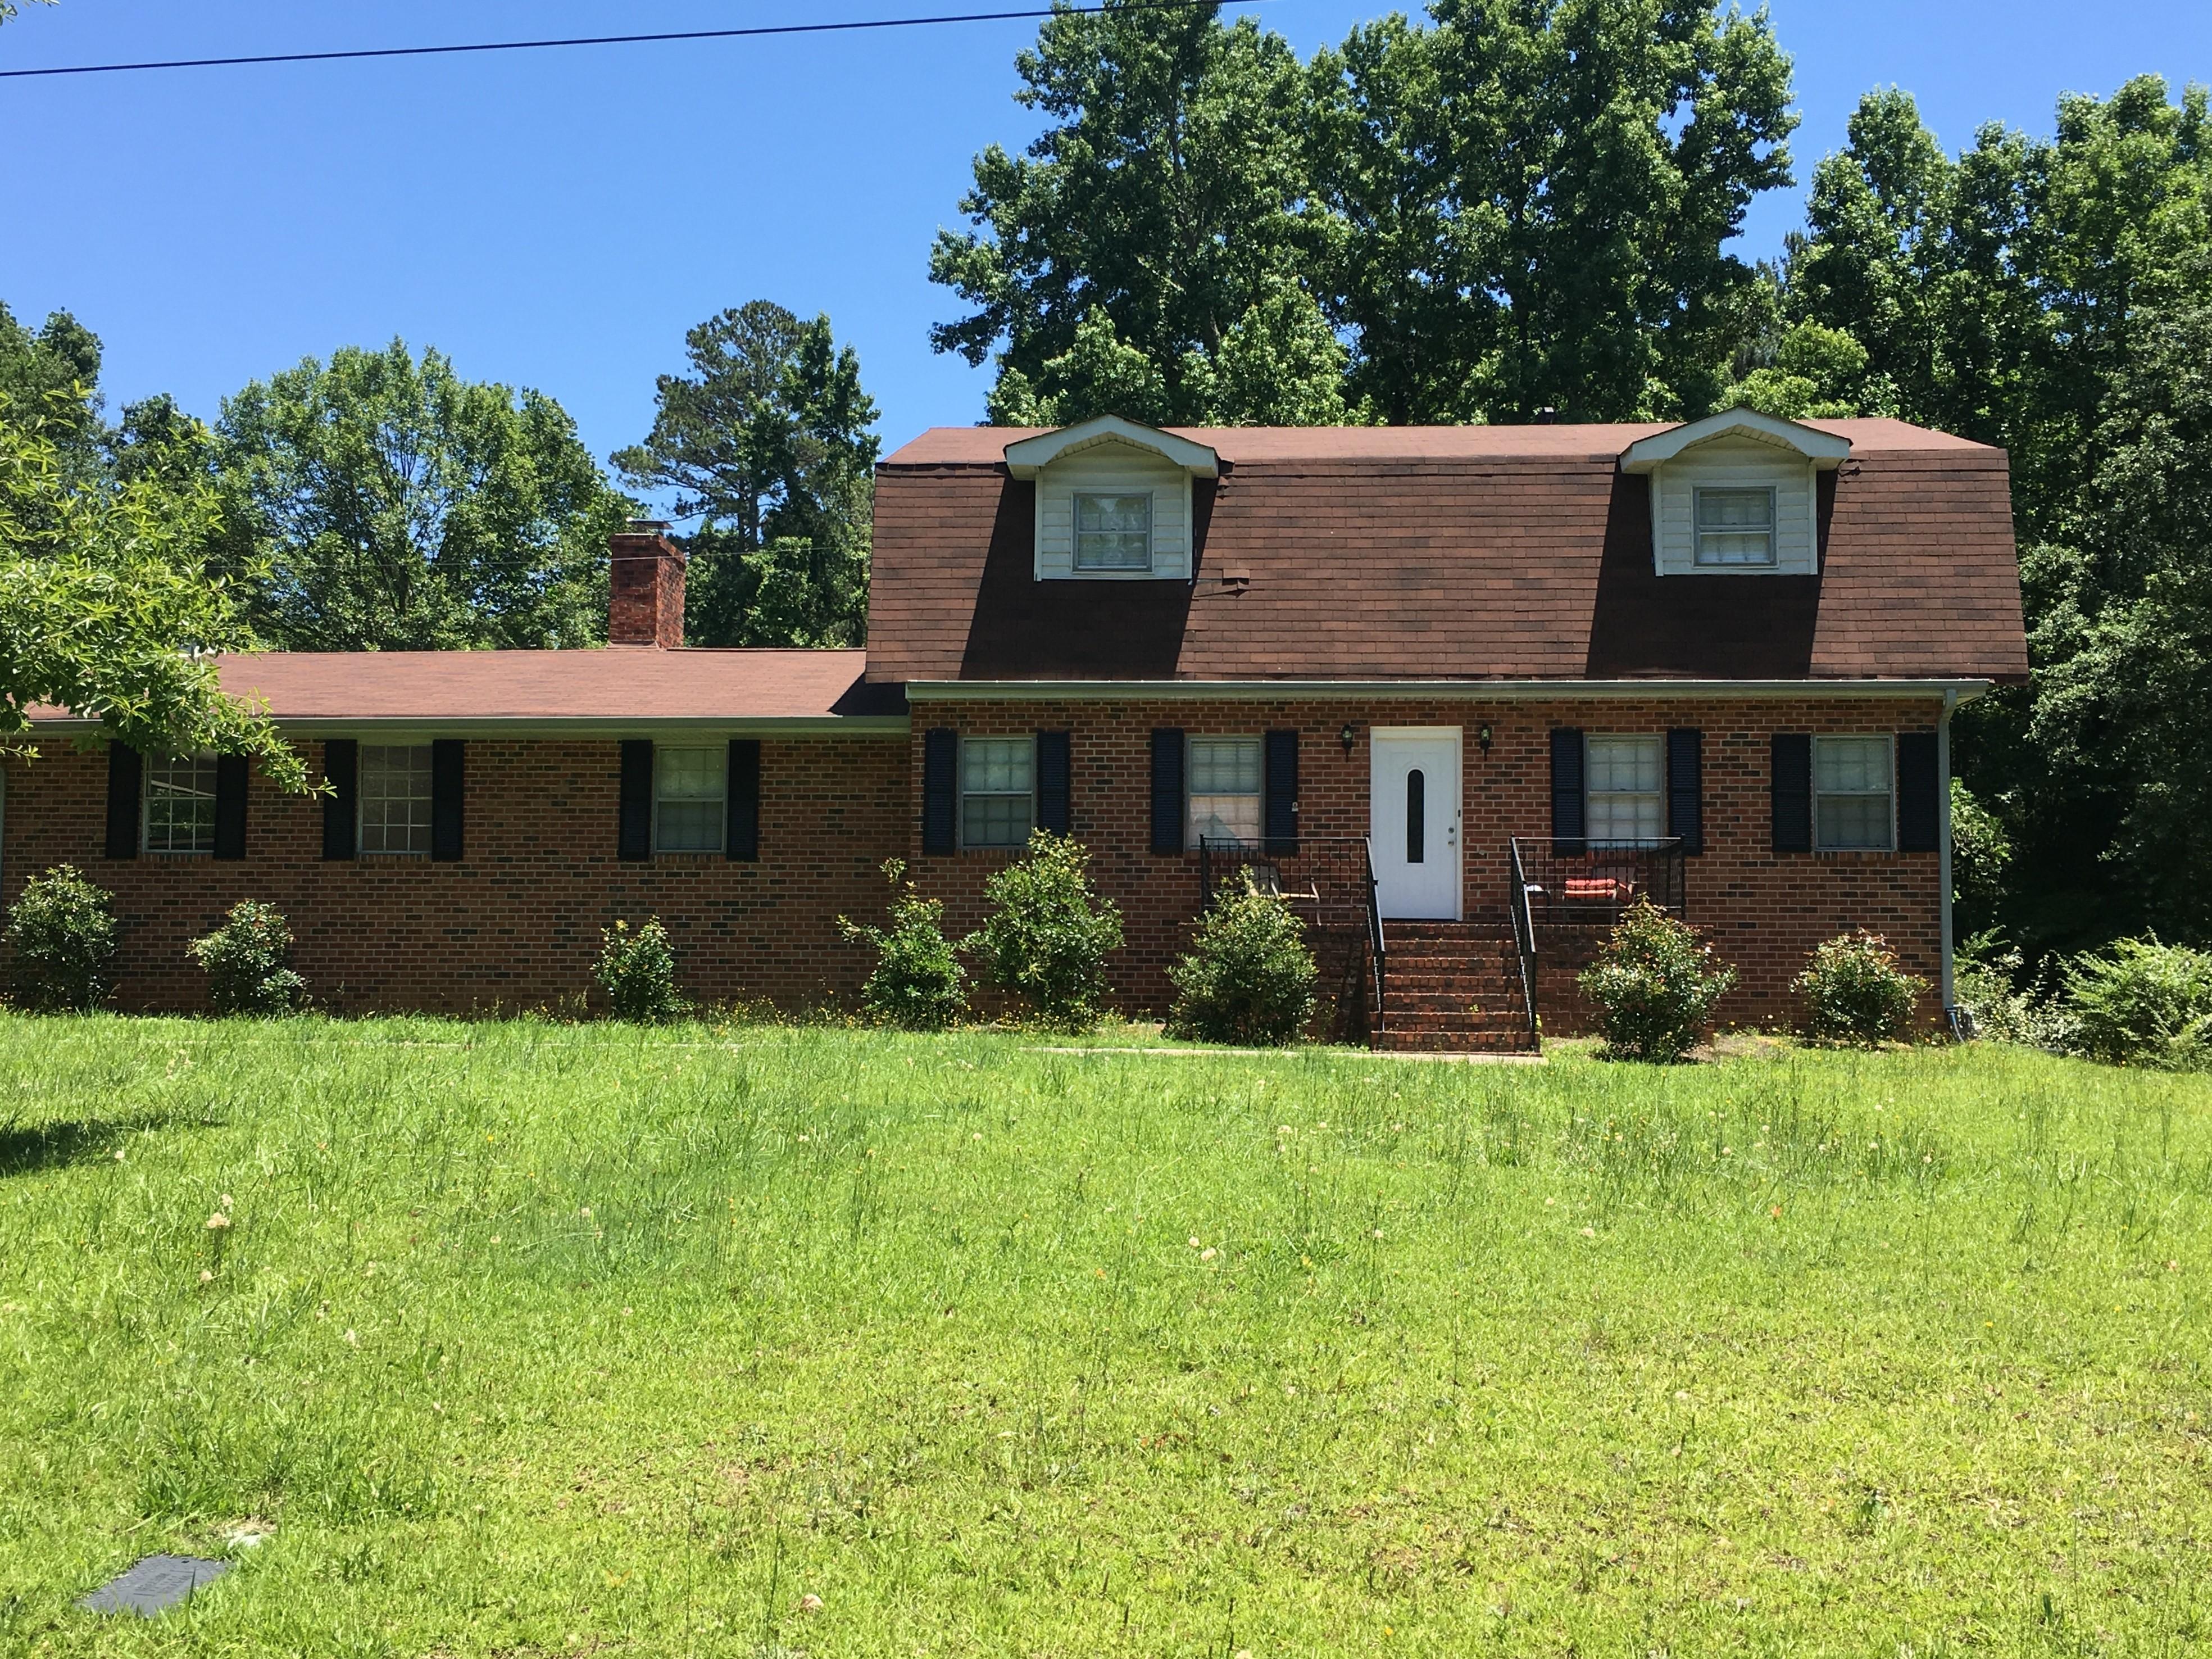 Photo of 11 Loblolly Drive , Newnan , GA , 30263